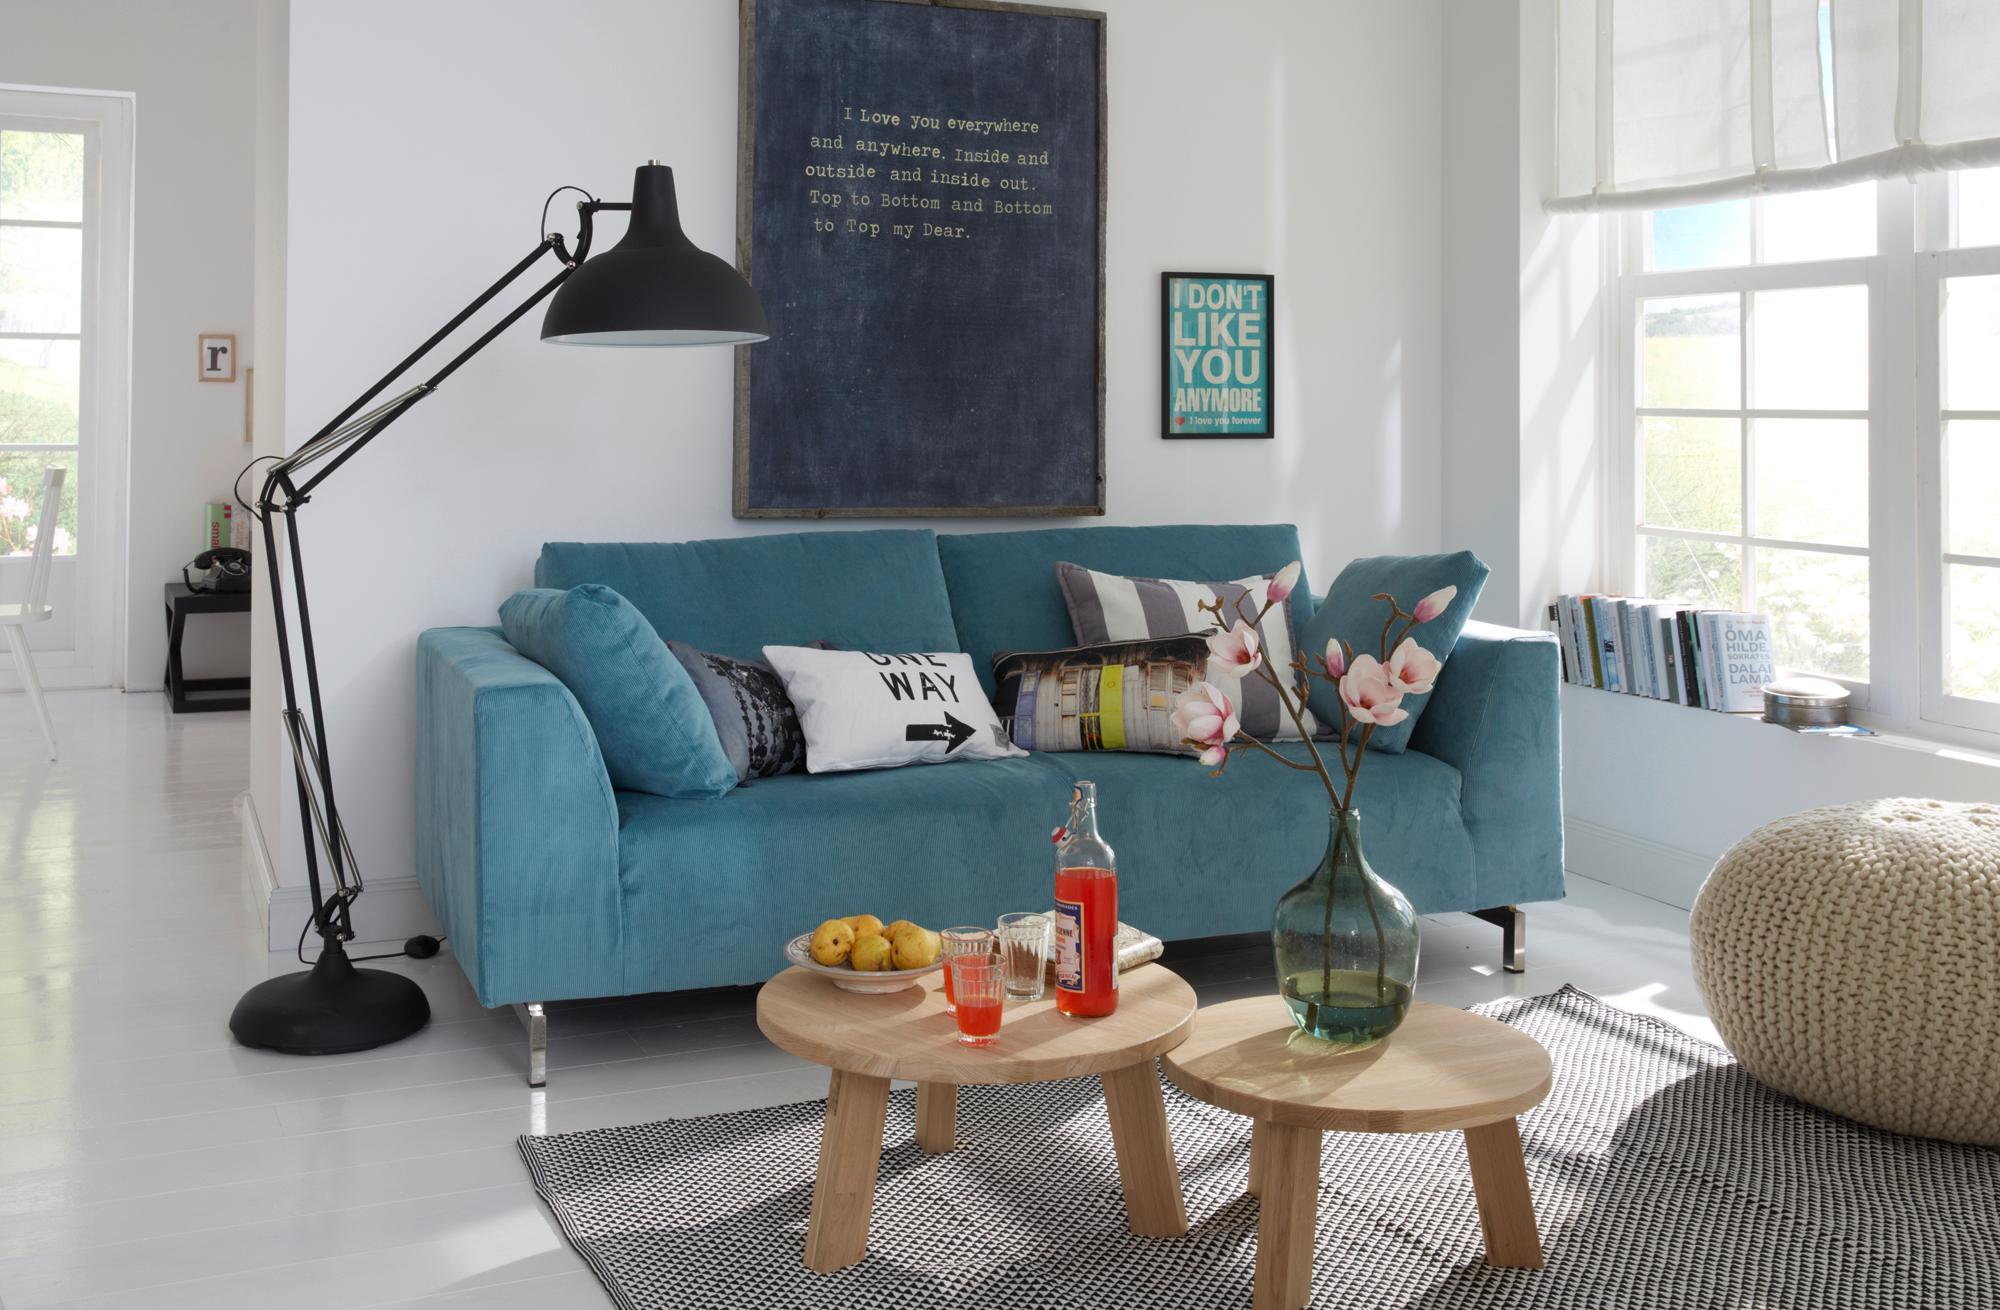 Full Size of Sofa Bezug Abnehmbar Waschbar Big Waschbarer Grau Abnehmbarer Modulares Mit Abnehmbarem Abnehmbaren Ikea Hussen Sofas 3er Aus Cord Couchtisch Togo Mondo Sofa Sofa Abnehmbarer Bezug